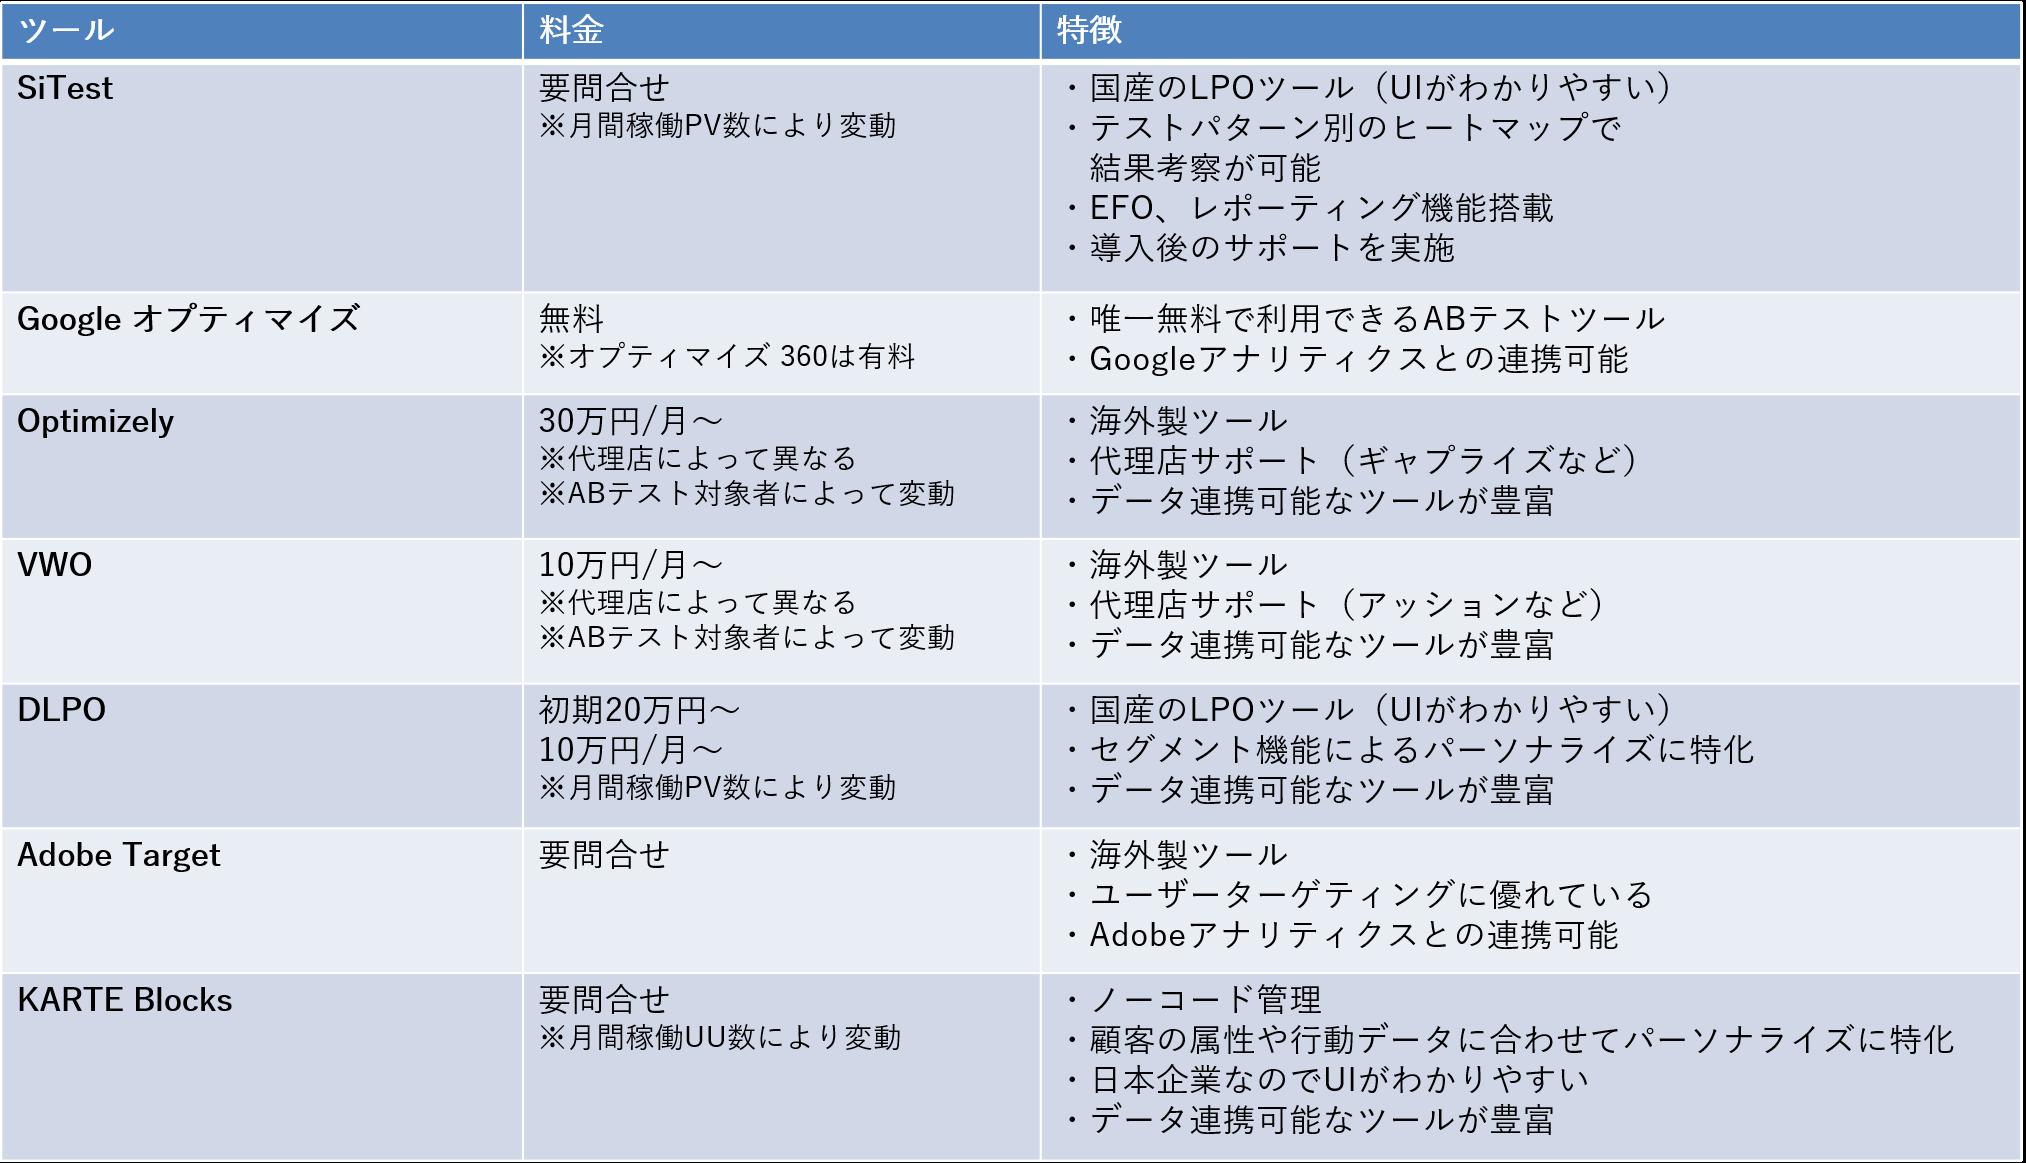 ABテストツール比較表